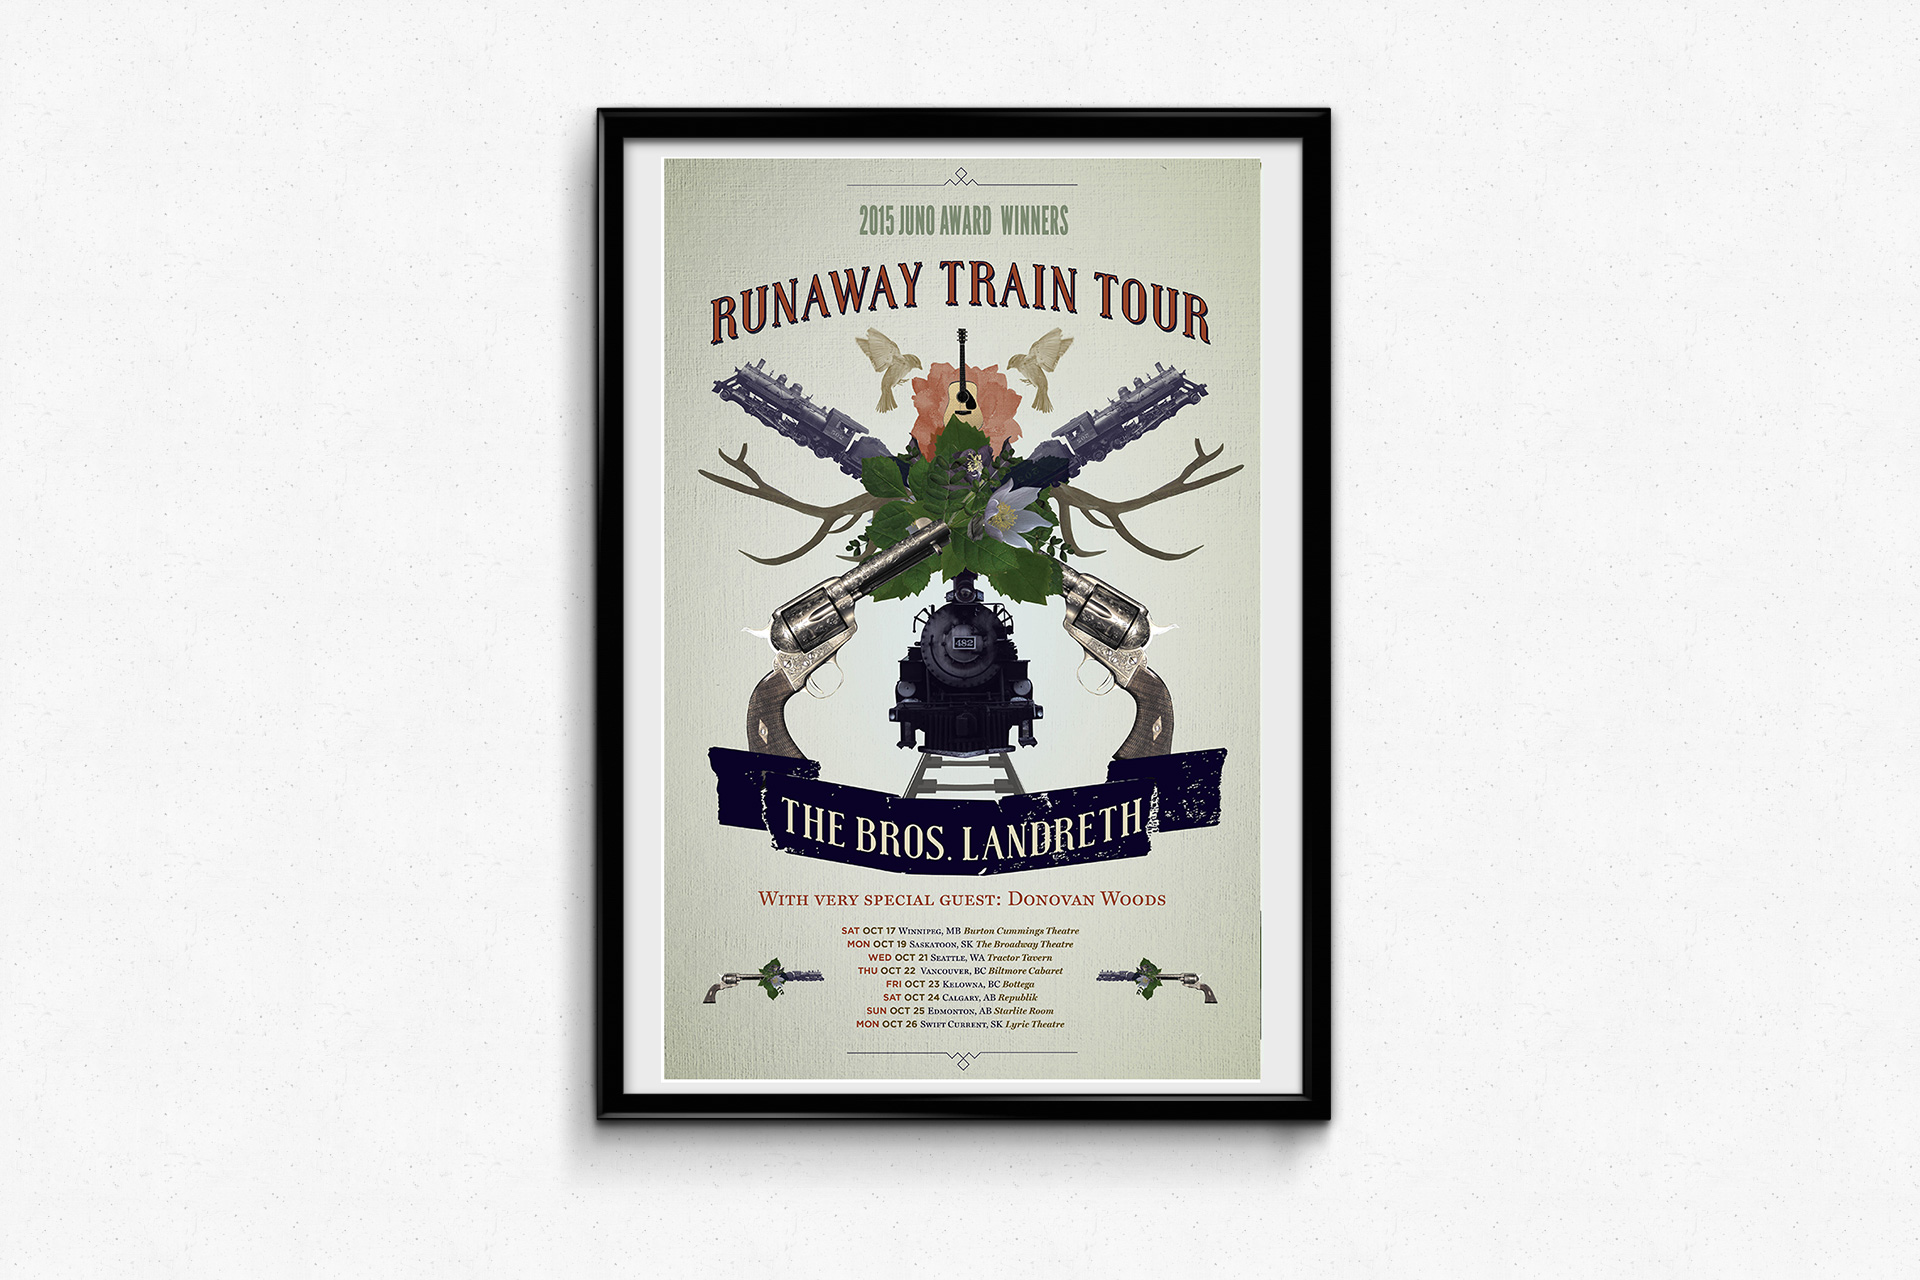 The Bros. Landreth – Runaway Train Tour